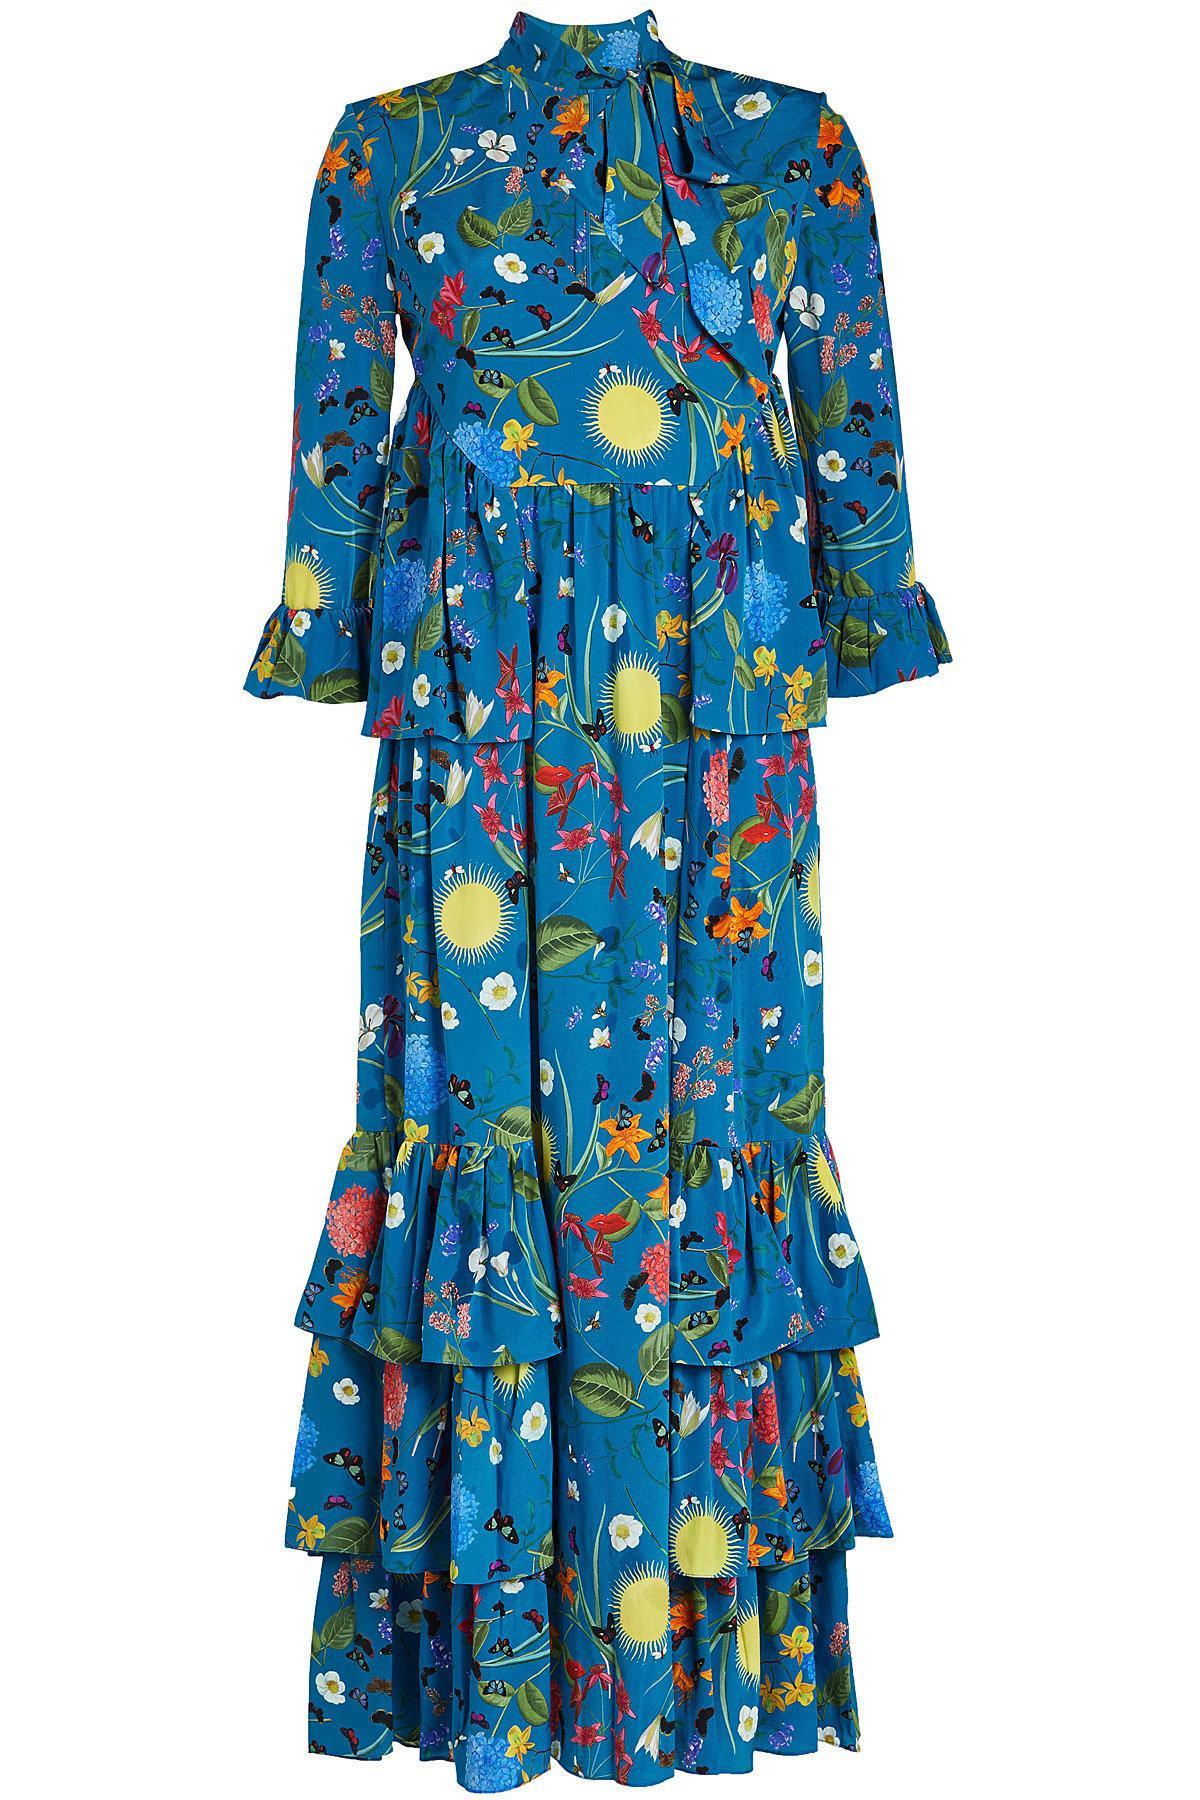 071b9da409375 Lyst - Borgo De Nor Aude Printed Silk Dress in Blue - Save 42%